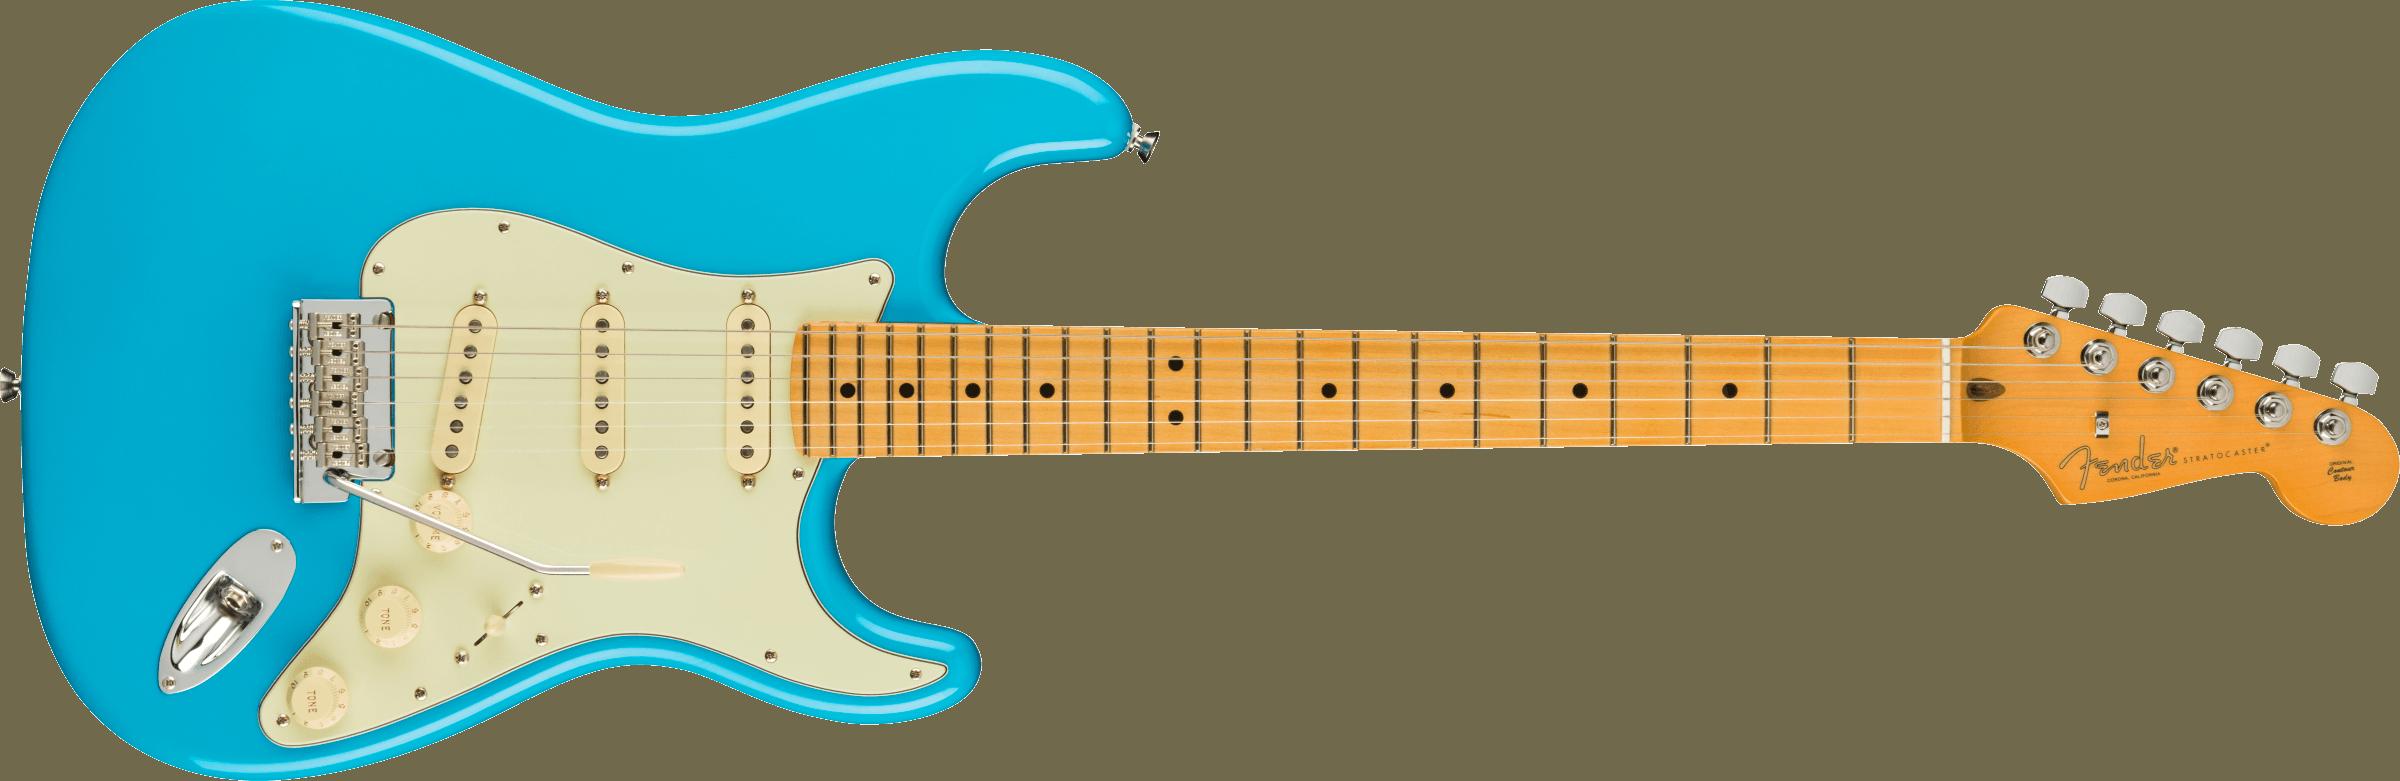 FENDER-American-Professional-II-Stratocaster-Maple-Fingerboard-Miami-Blue-sku-571005525